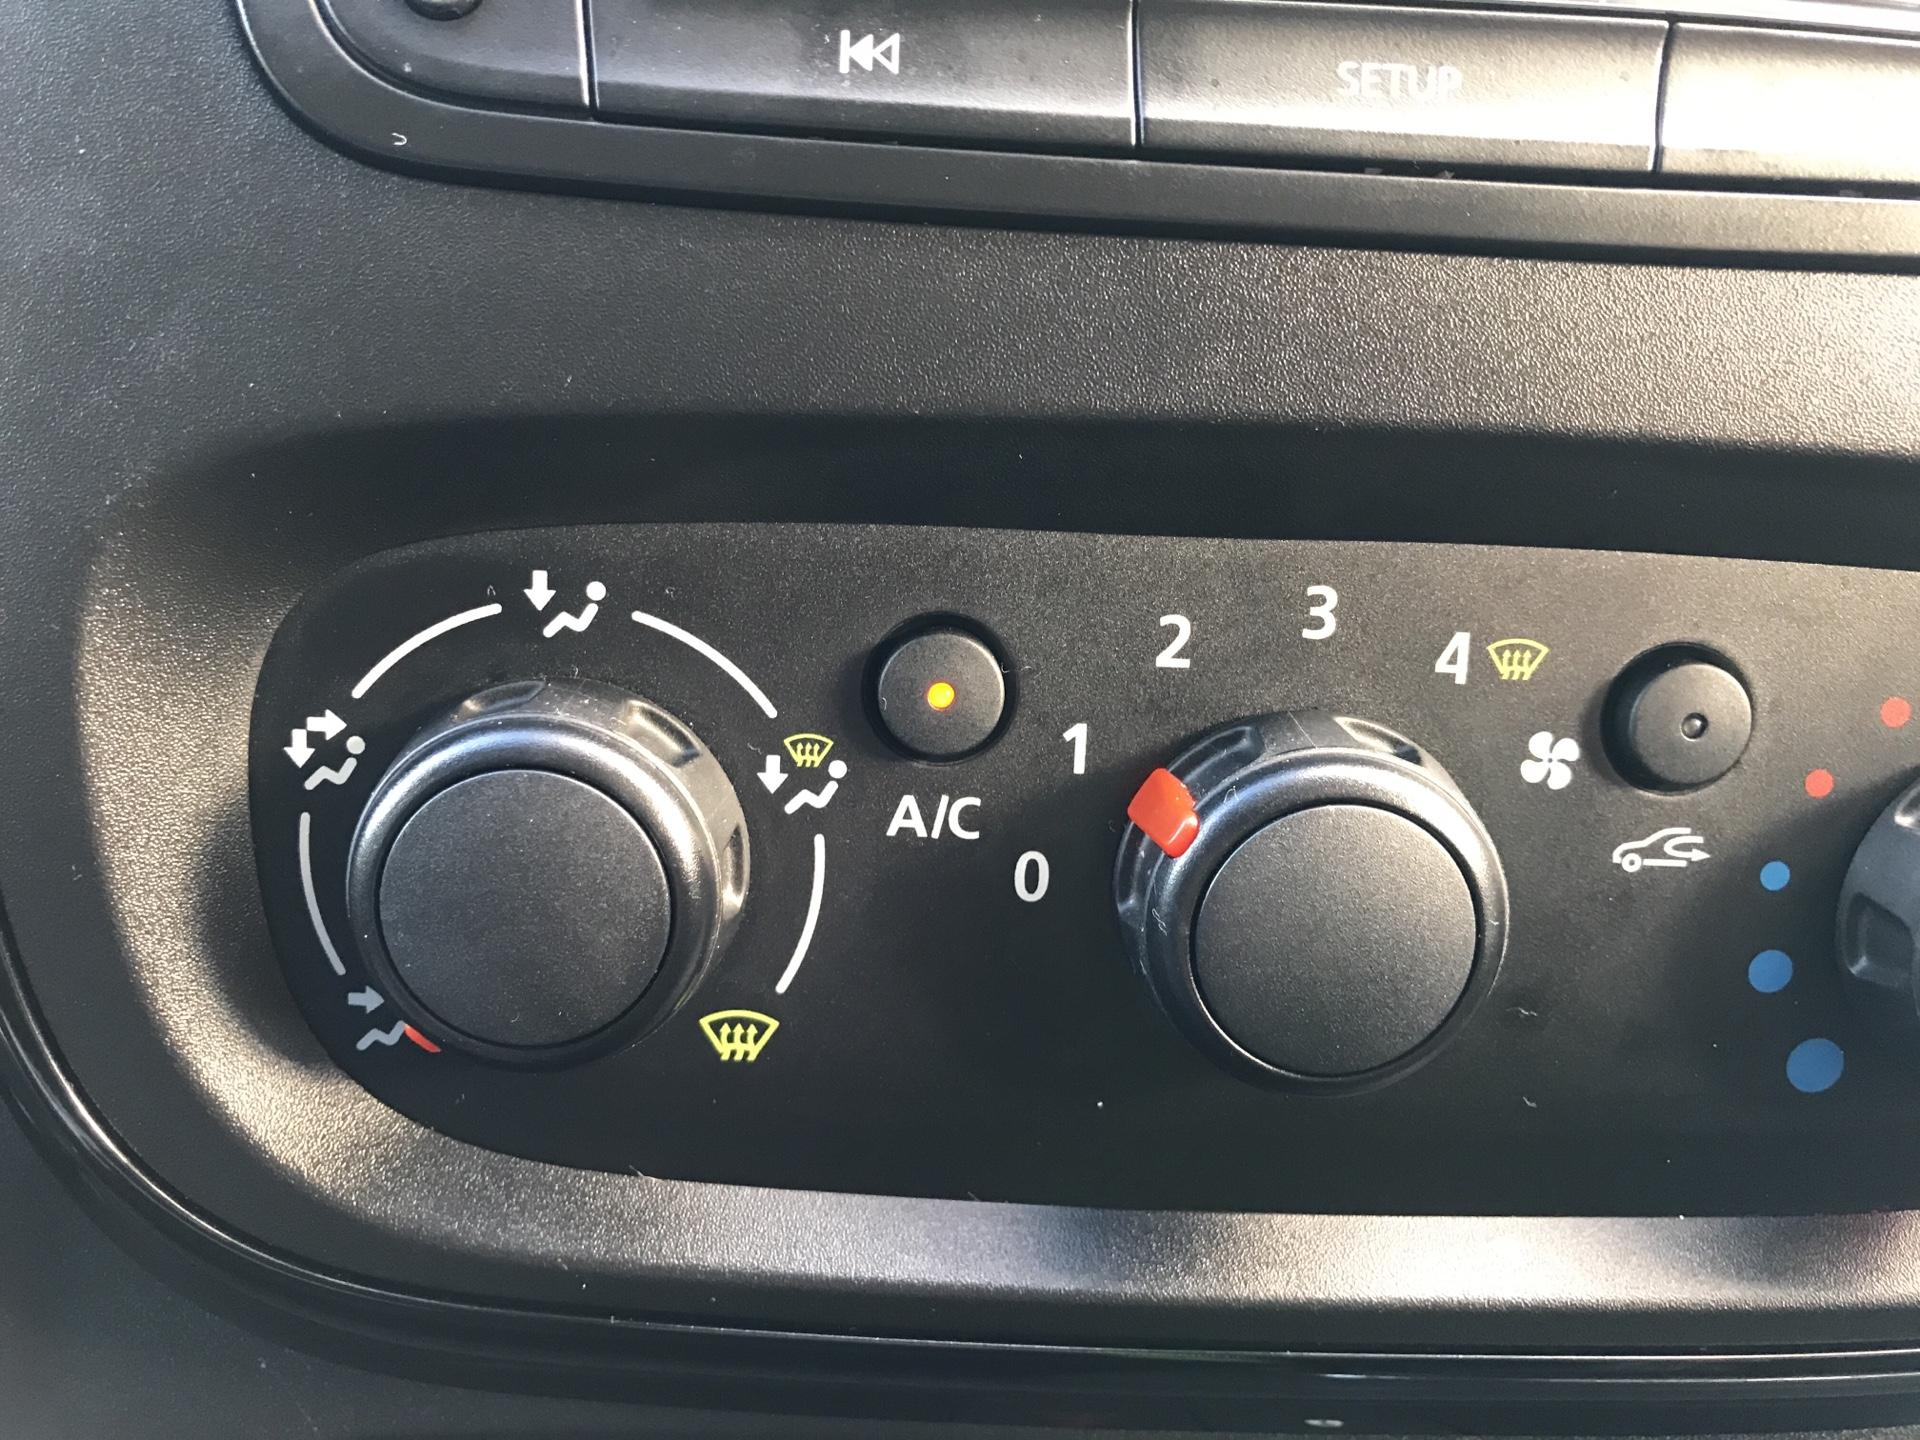 2017 Vauxhall Vivaro L1 H1 2700 1.6 CDTI 120PS SPORTIVE EURO 6 (ND17UNH) Image 15